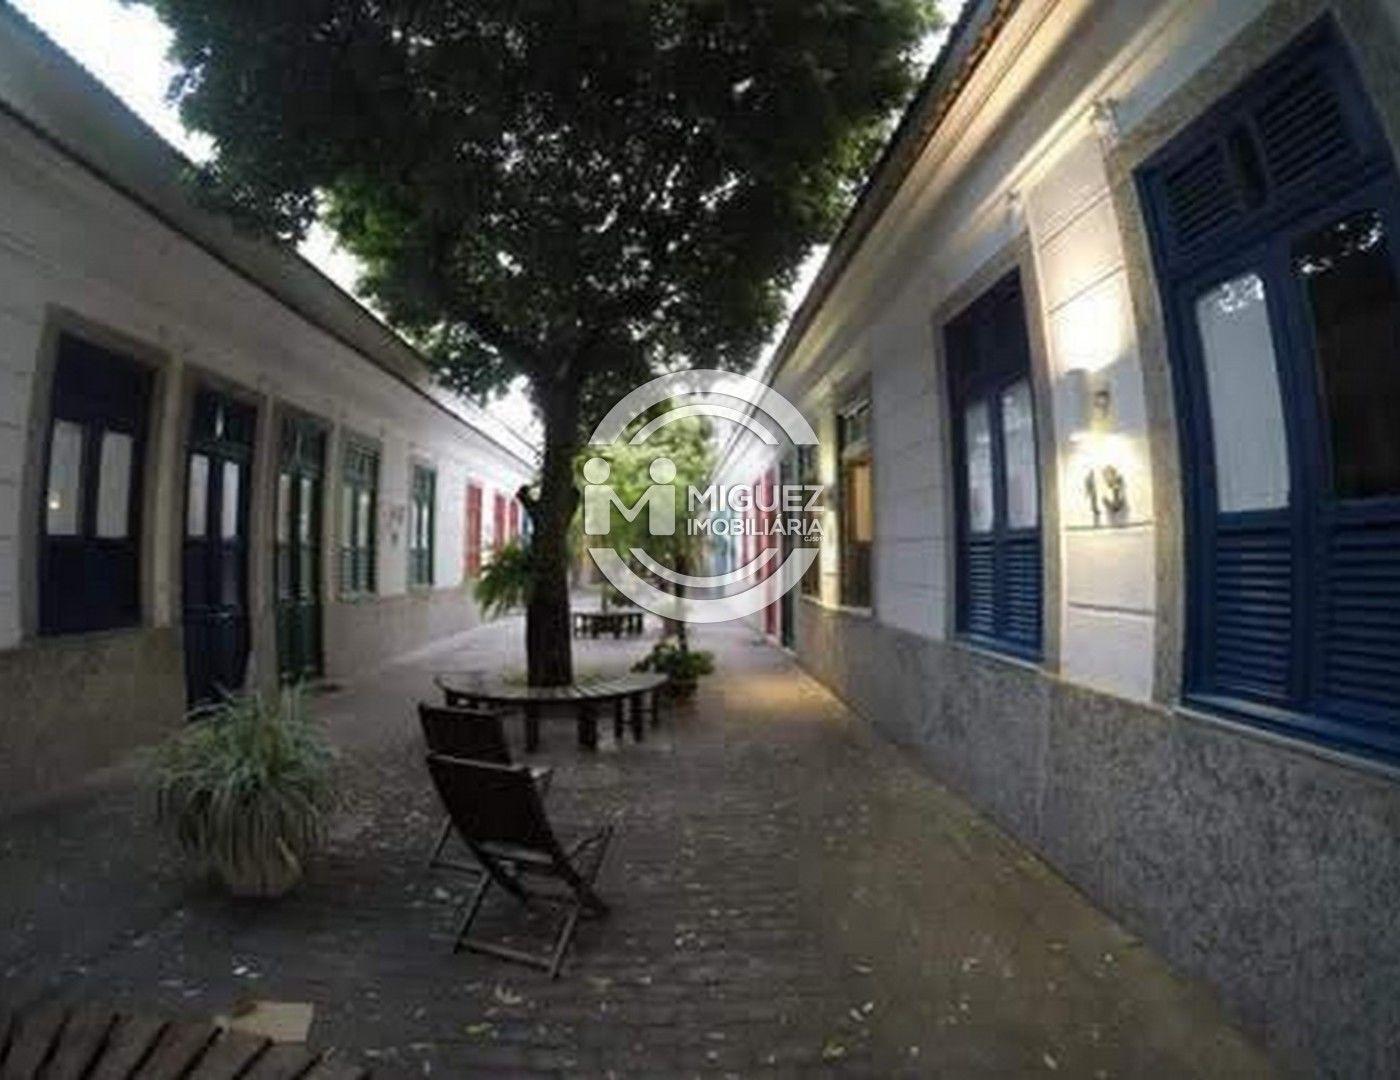 Casa, venda, Rua Doutor Satamini - Tijuca , Rio de janeiro